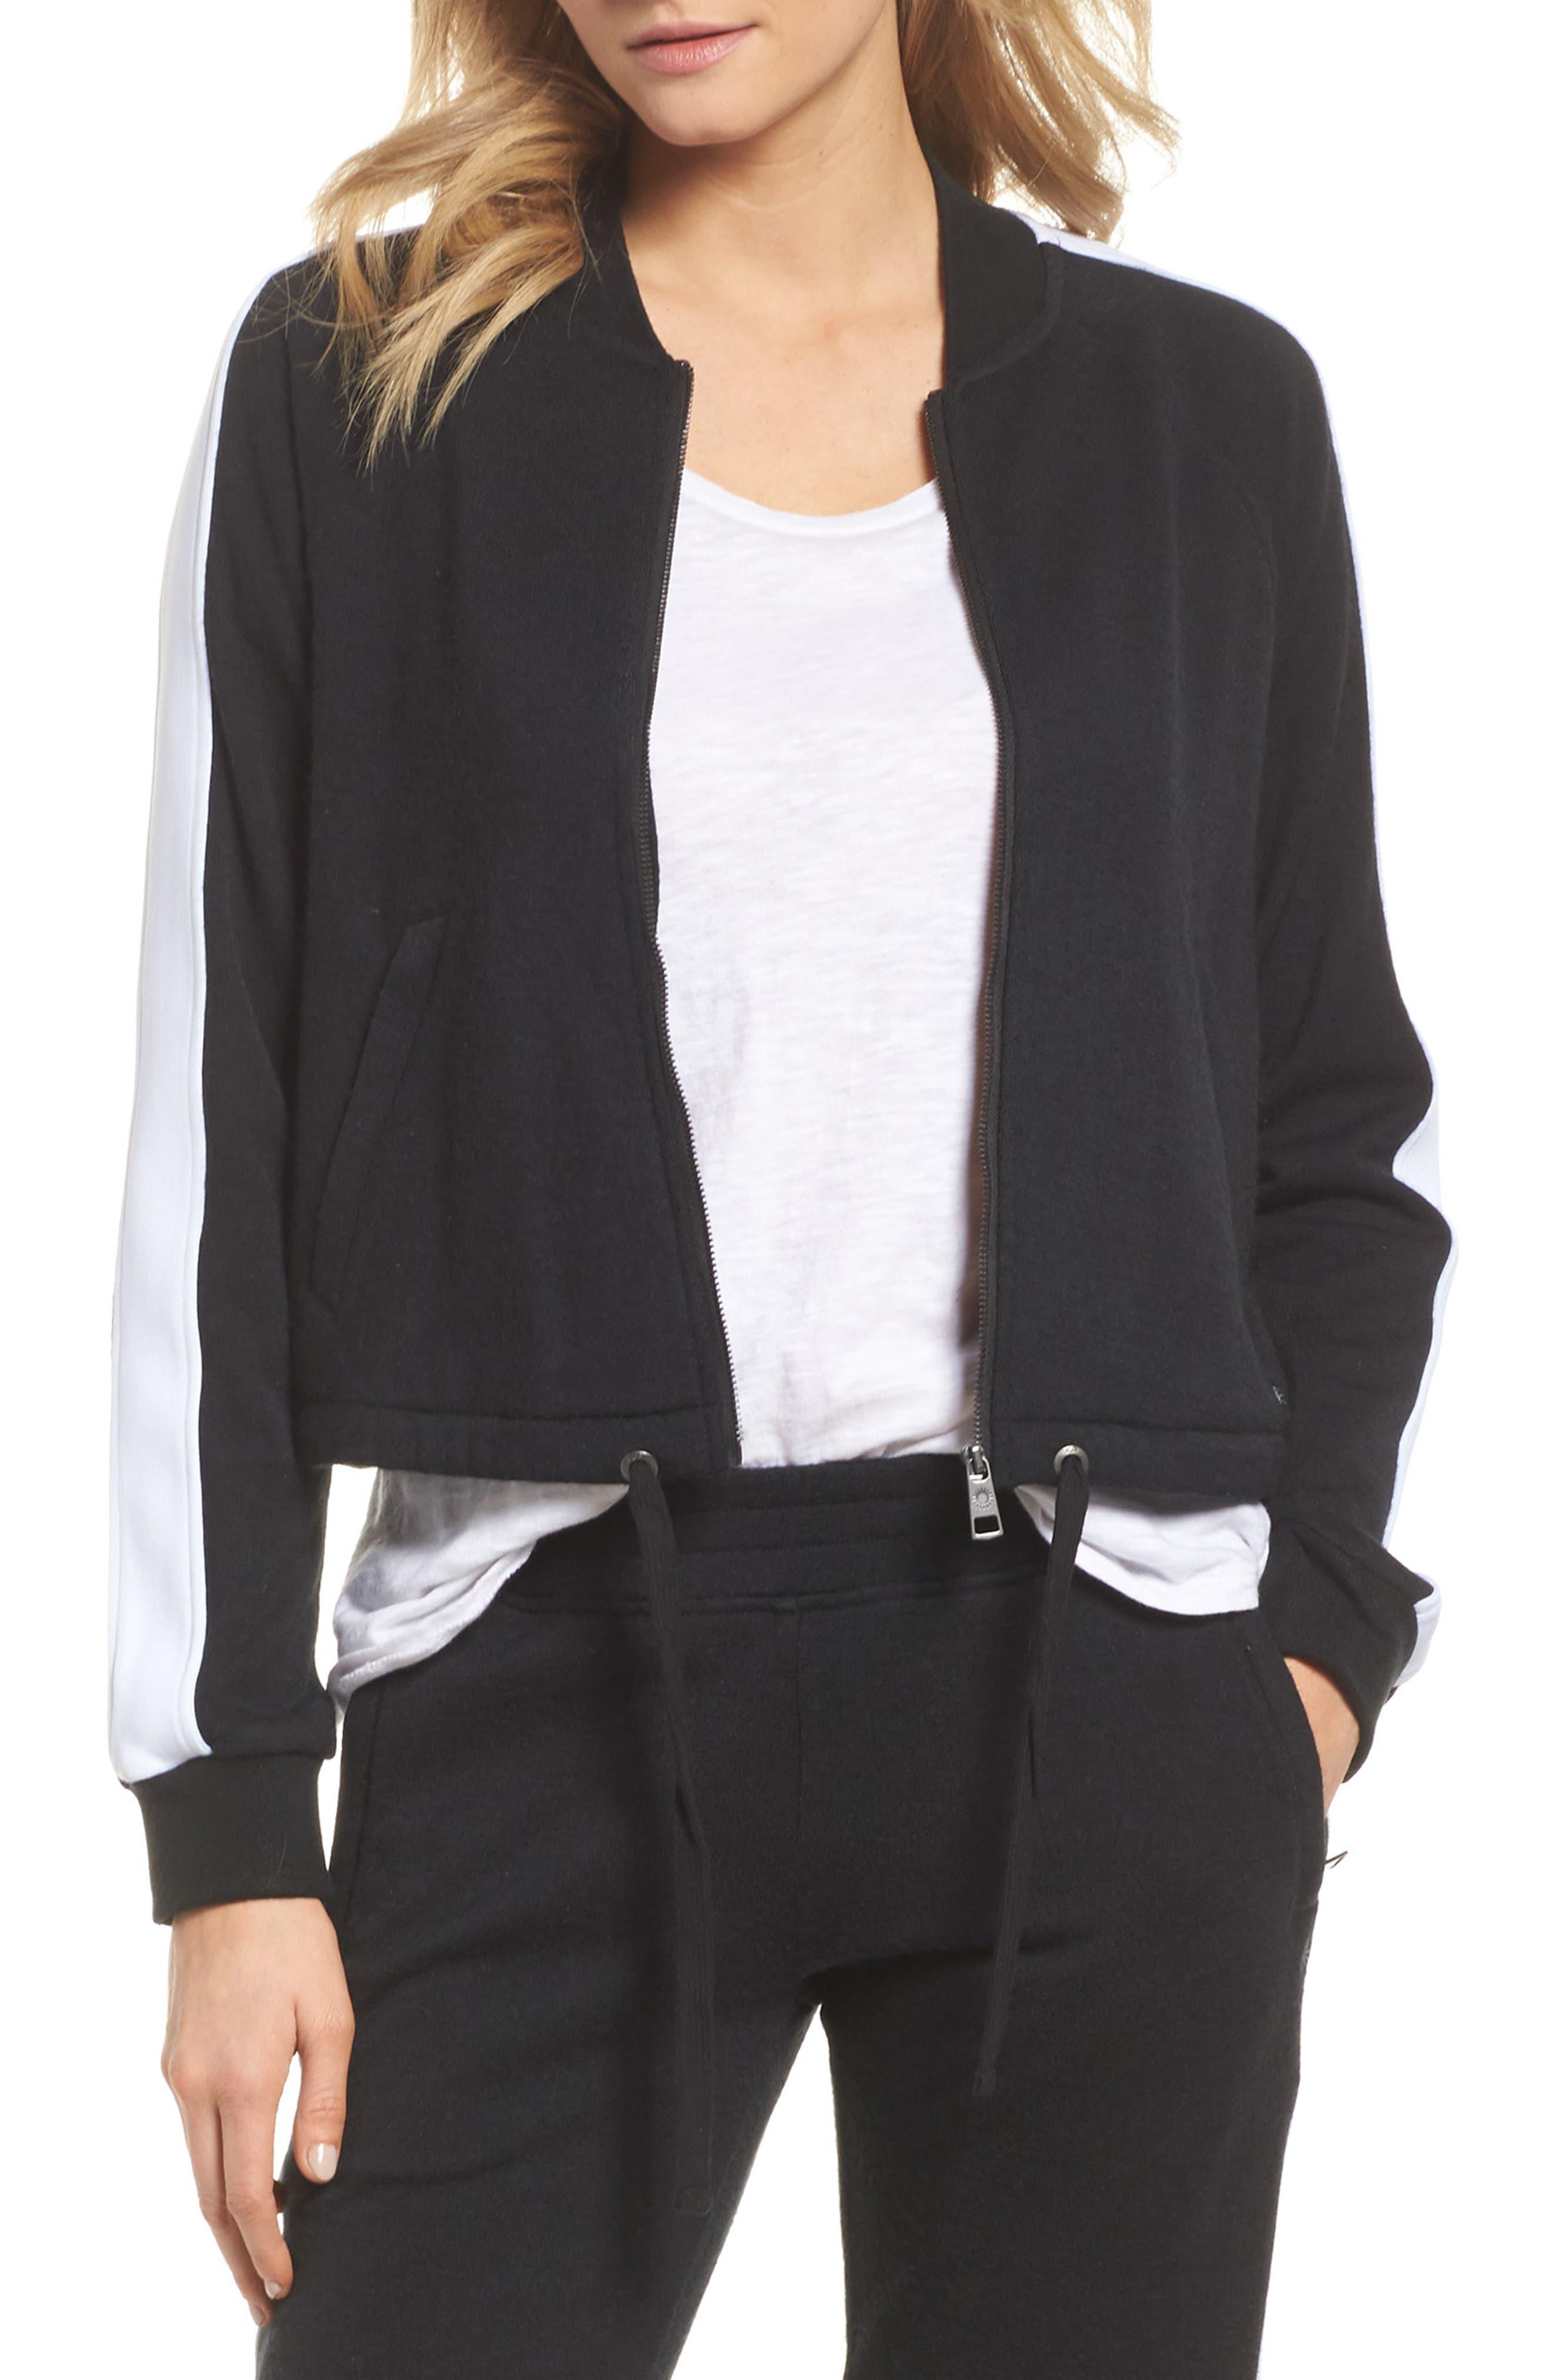 UGG<SUP>®</SUP> Lizy Track Jacket, Main, color, 003